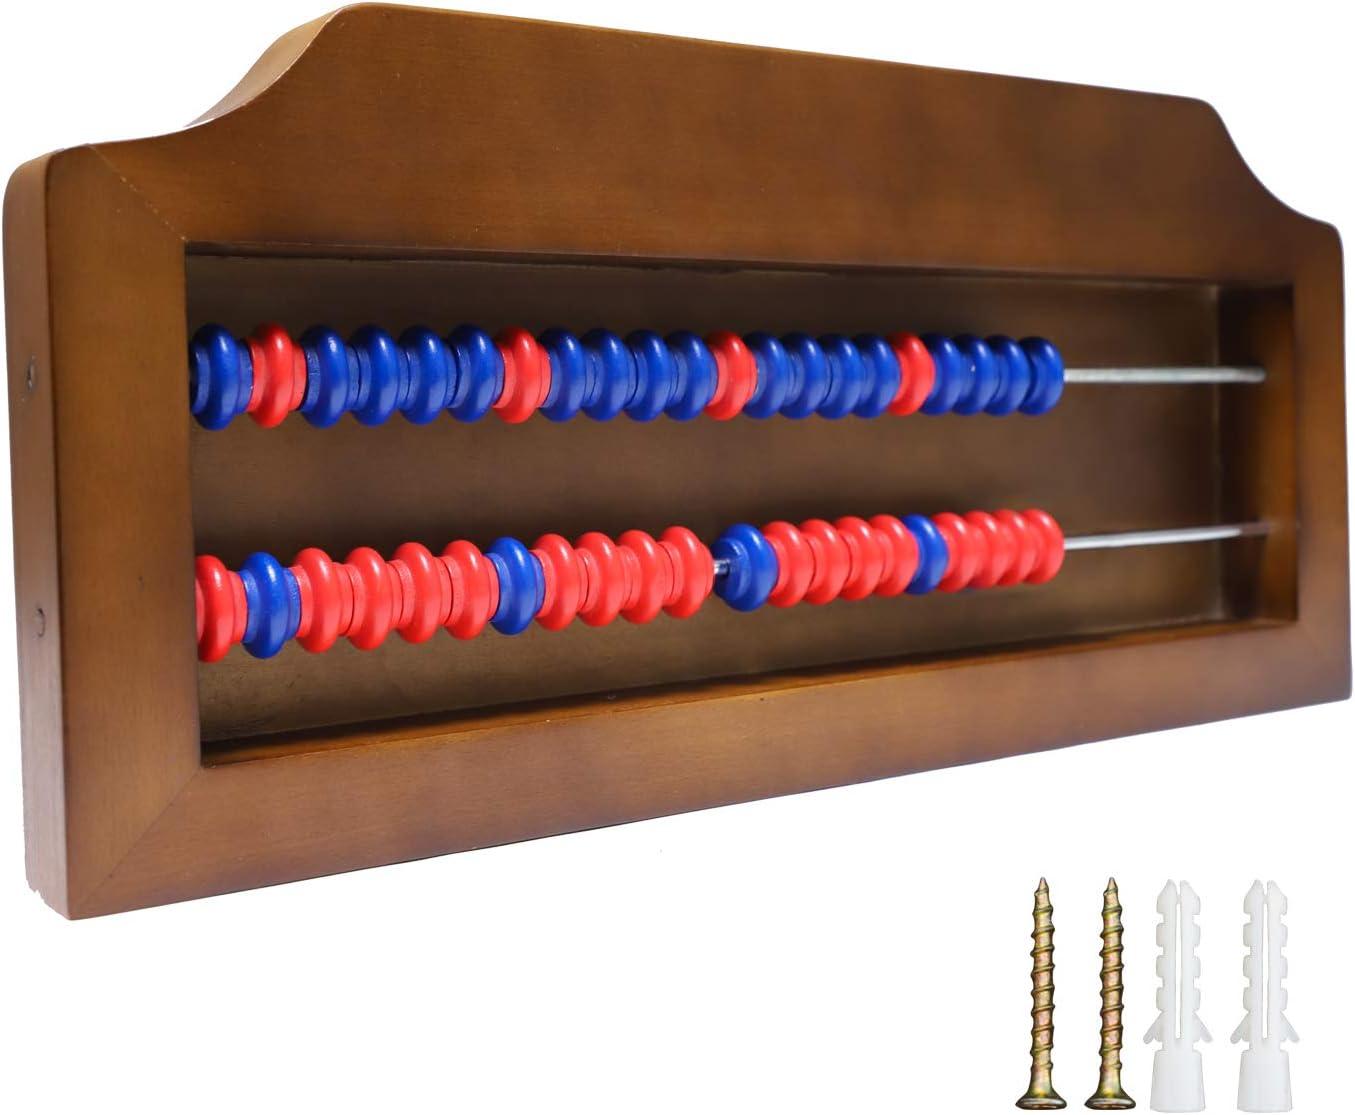 Shuffleboard Scoreboard Popular popular Solid-Wood Score for Shuffl Table System Max 83% OFF